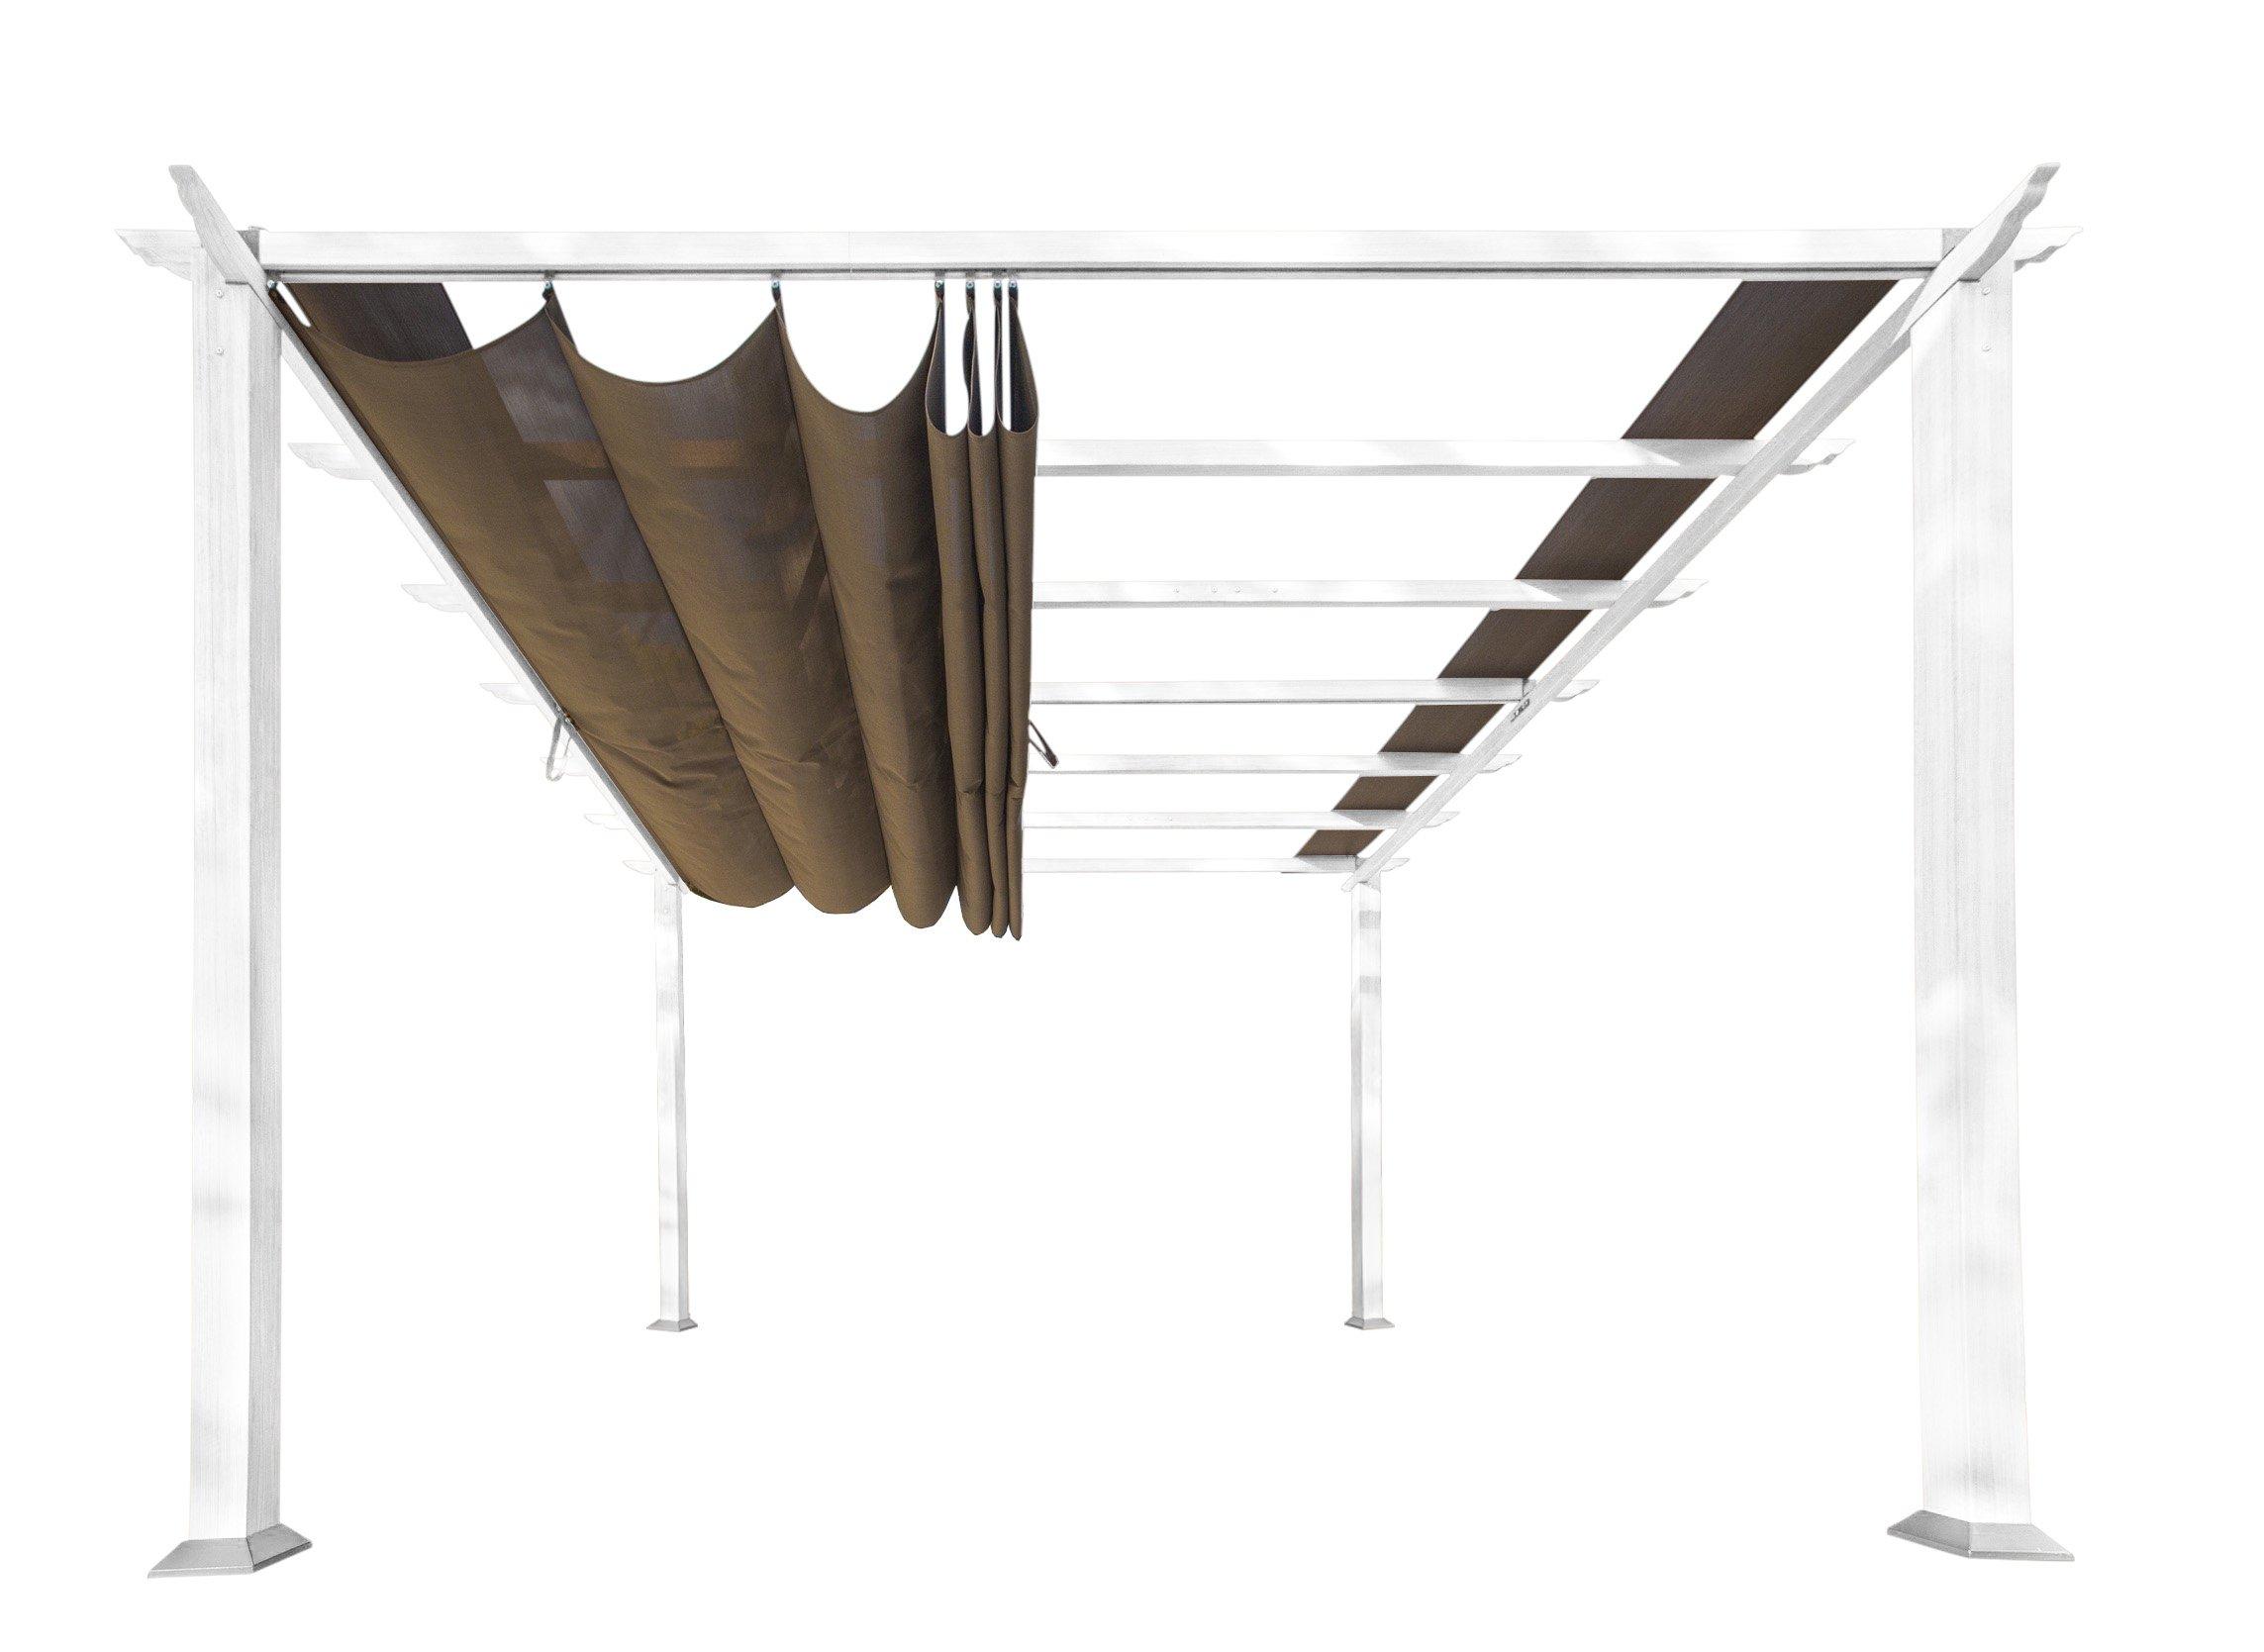 Paragon Outdoor PR11WTC Backyard Structure Soft Top with White Frame Aspen Pergola, 11' x 11' Cocoa